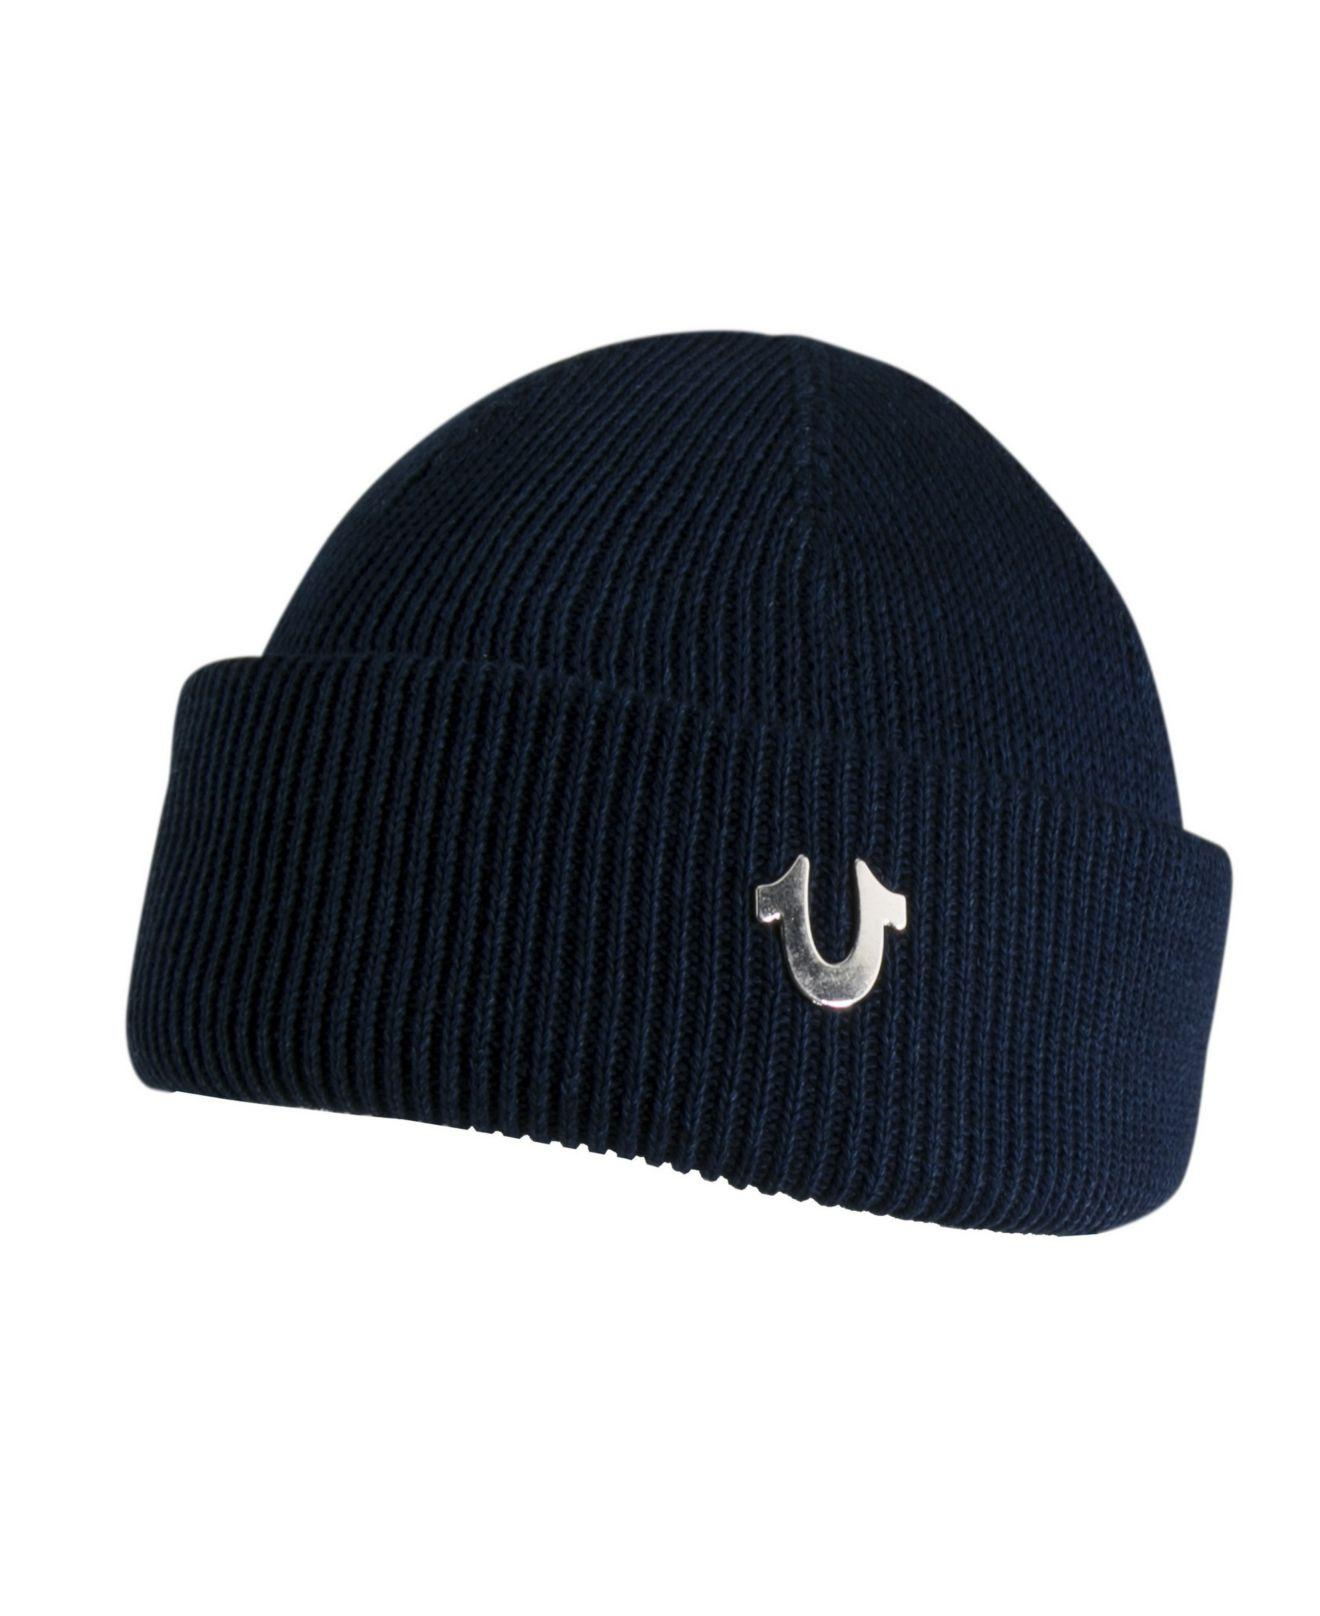 684036ee Lyst - True Religion Indigo-dyed Watchcap in Blue for Men